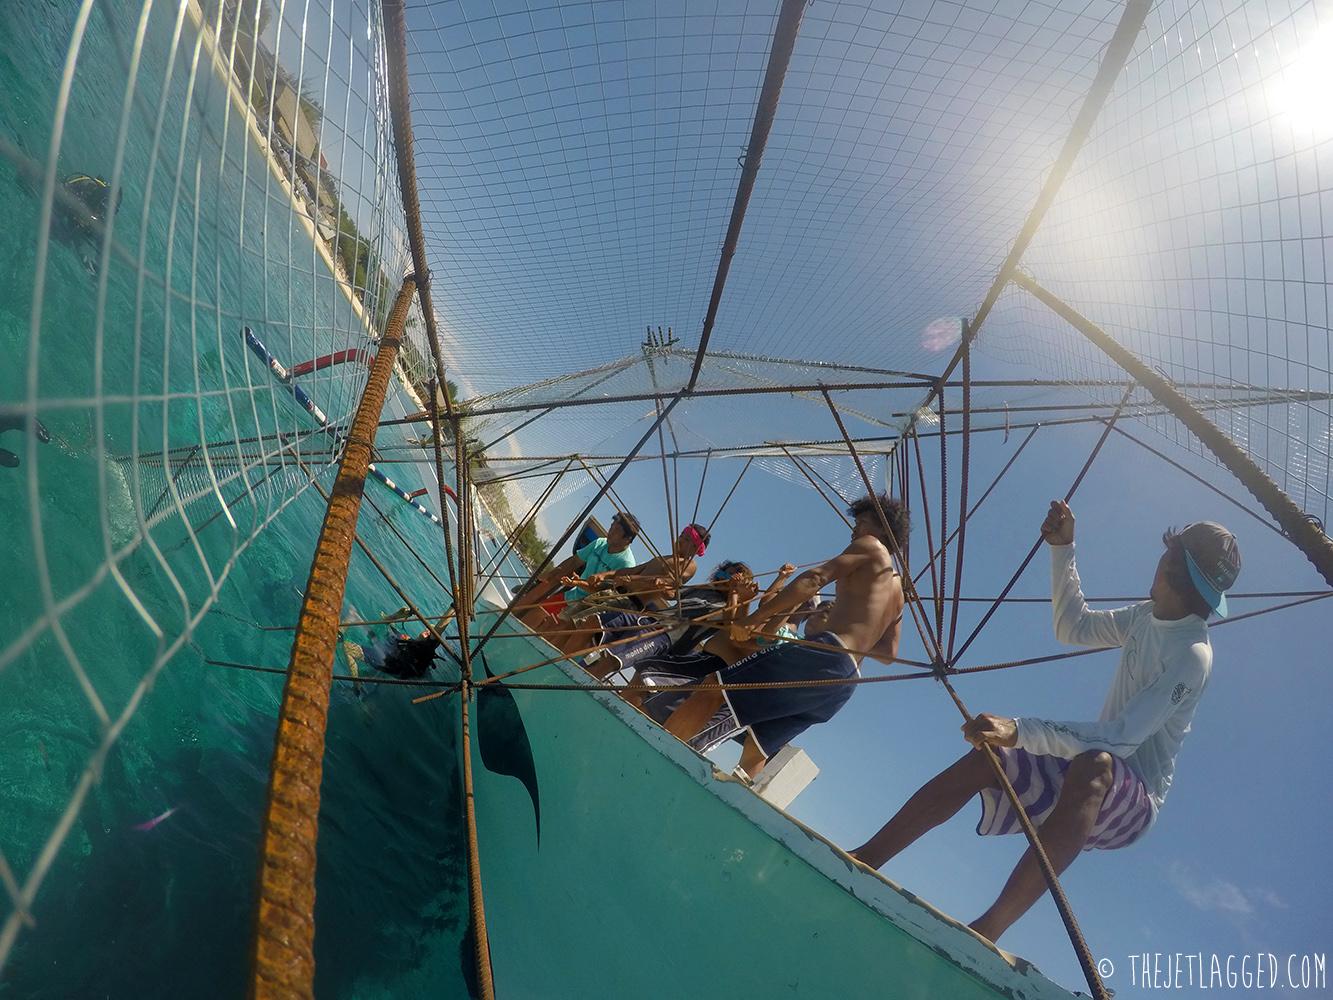 Sinking the Bintang Biorock from the Manta Dive Boat